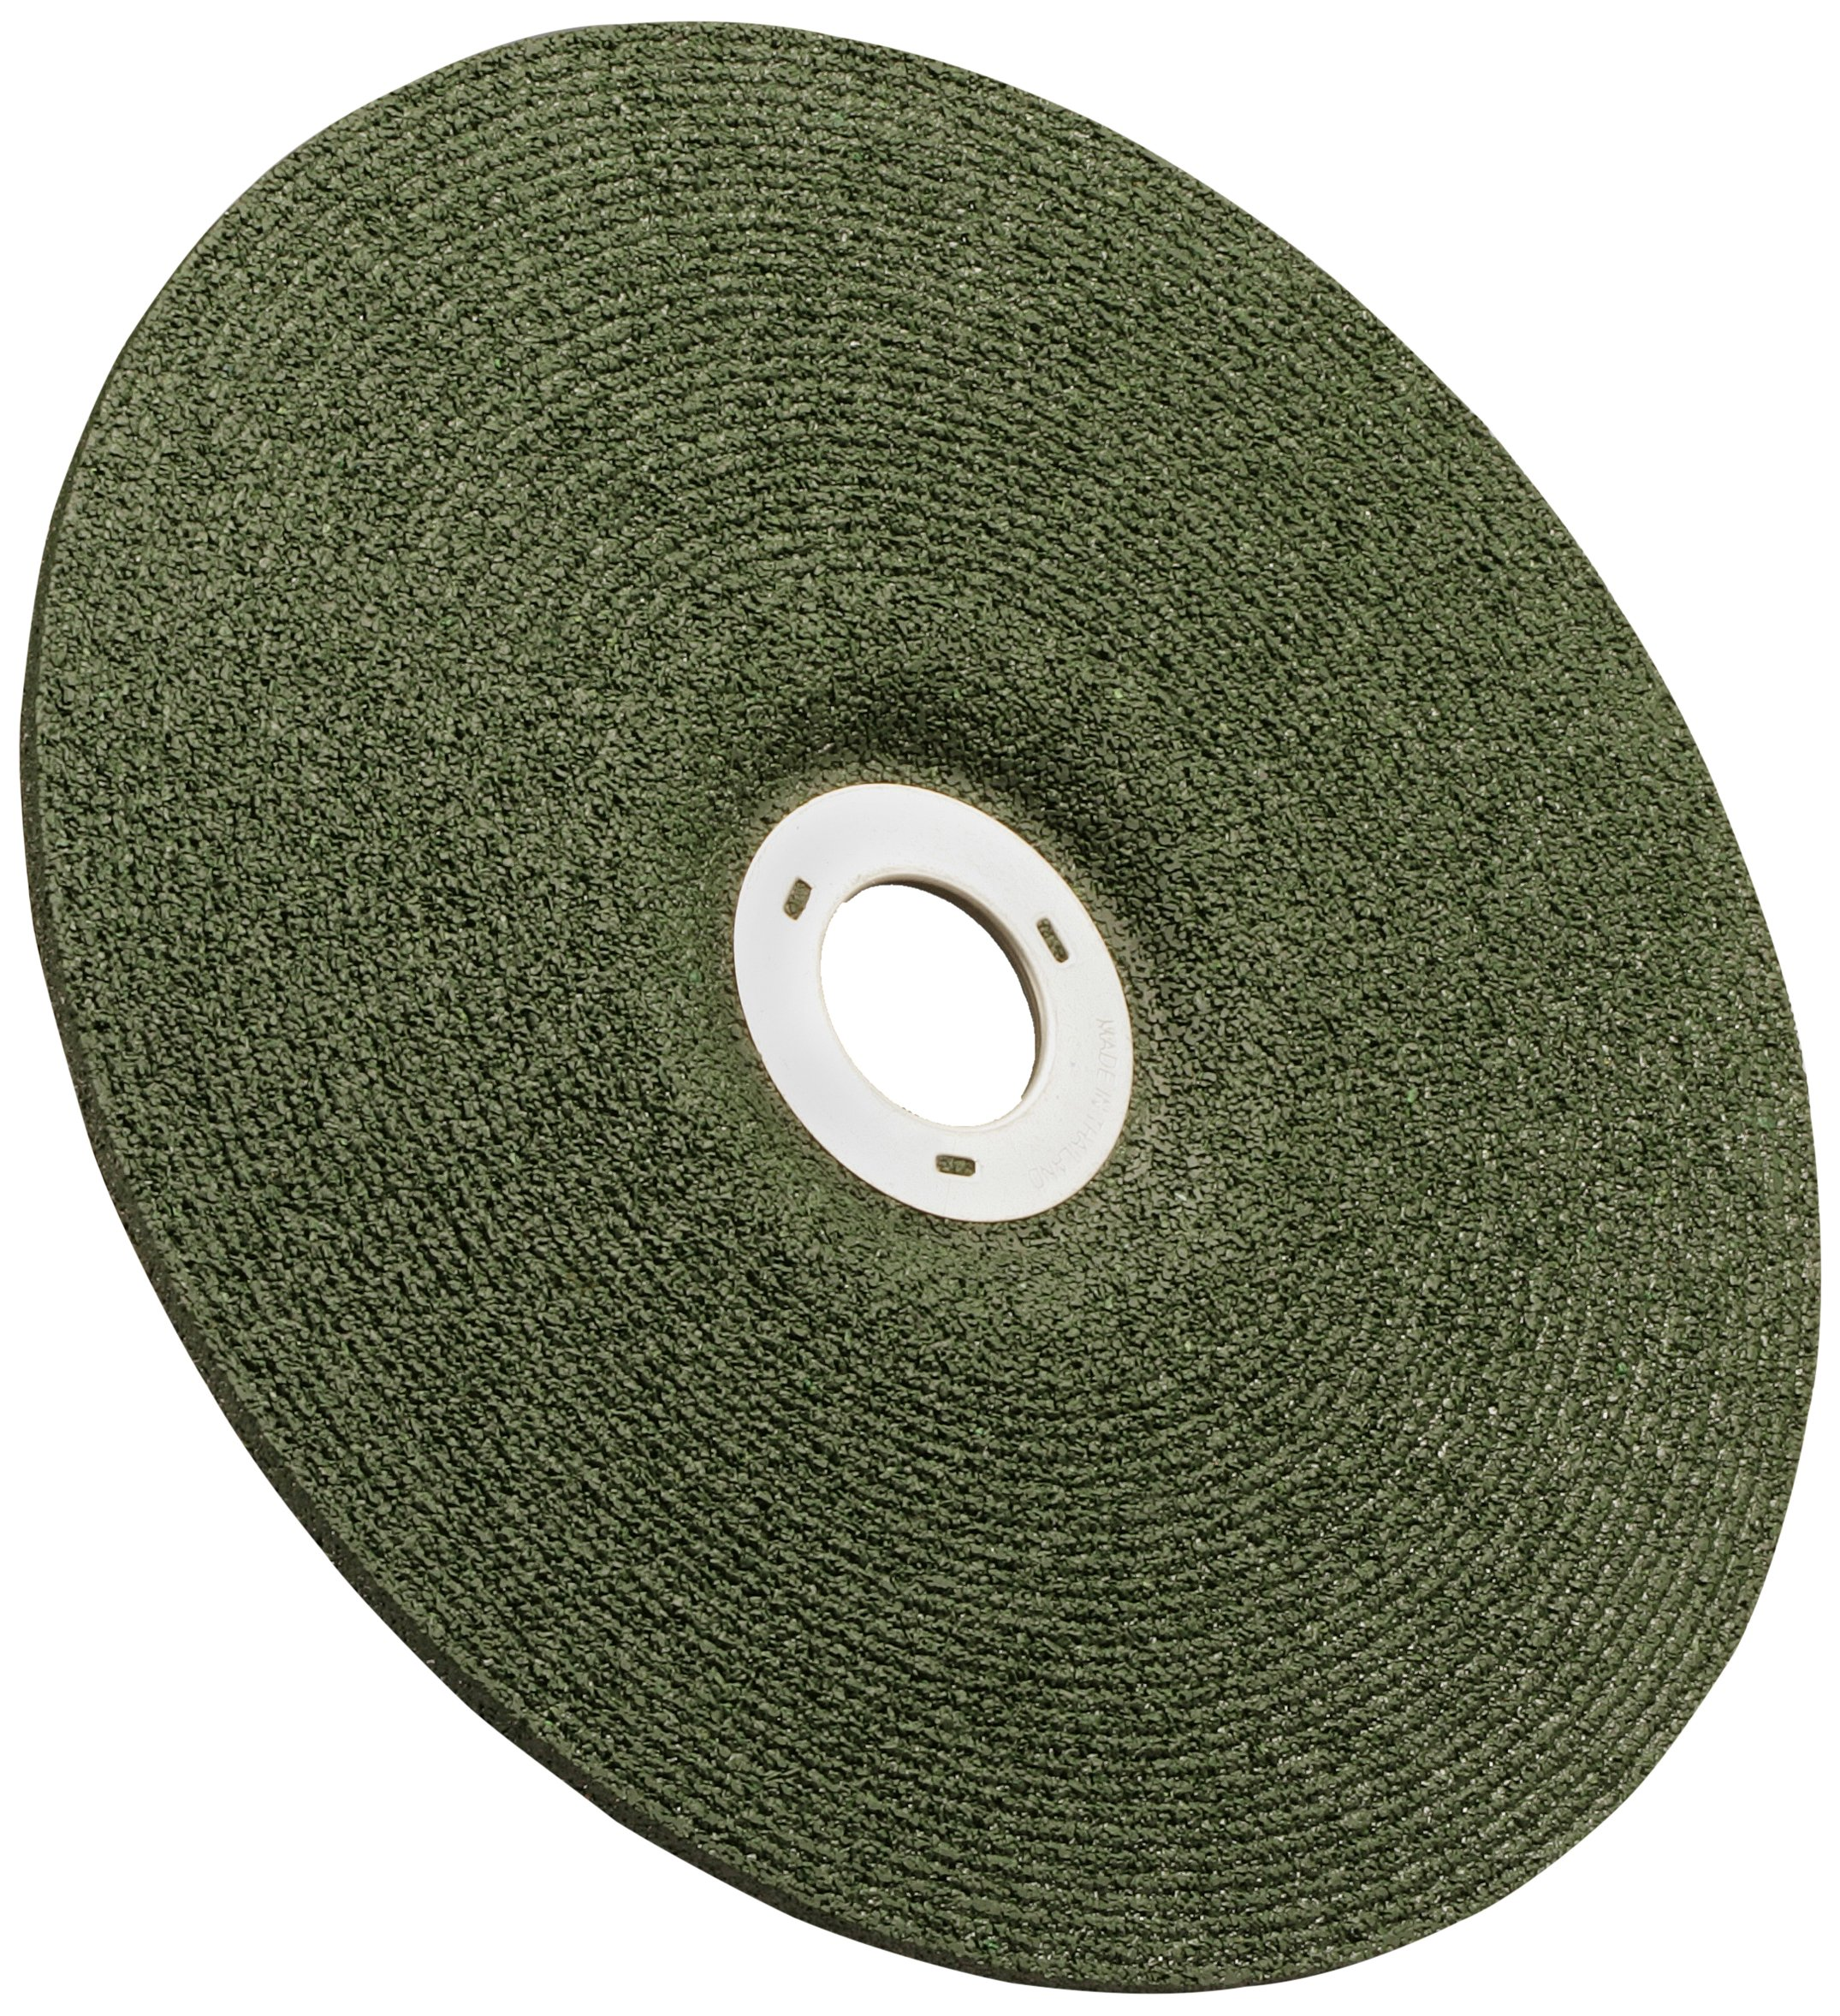 3M(TM) Green Corps(TM) Cutting/Grinding